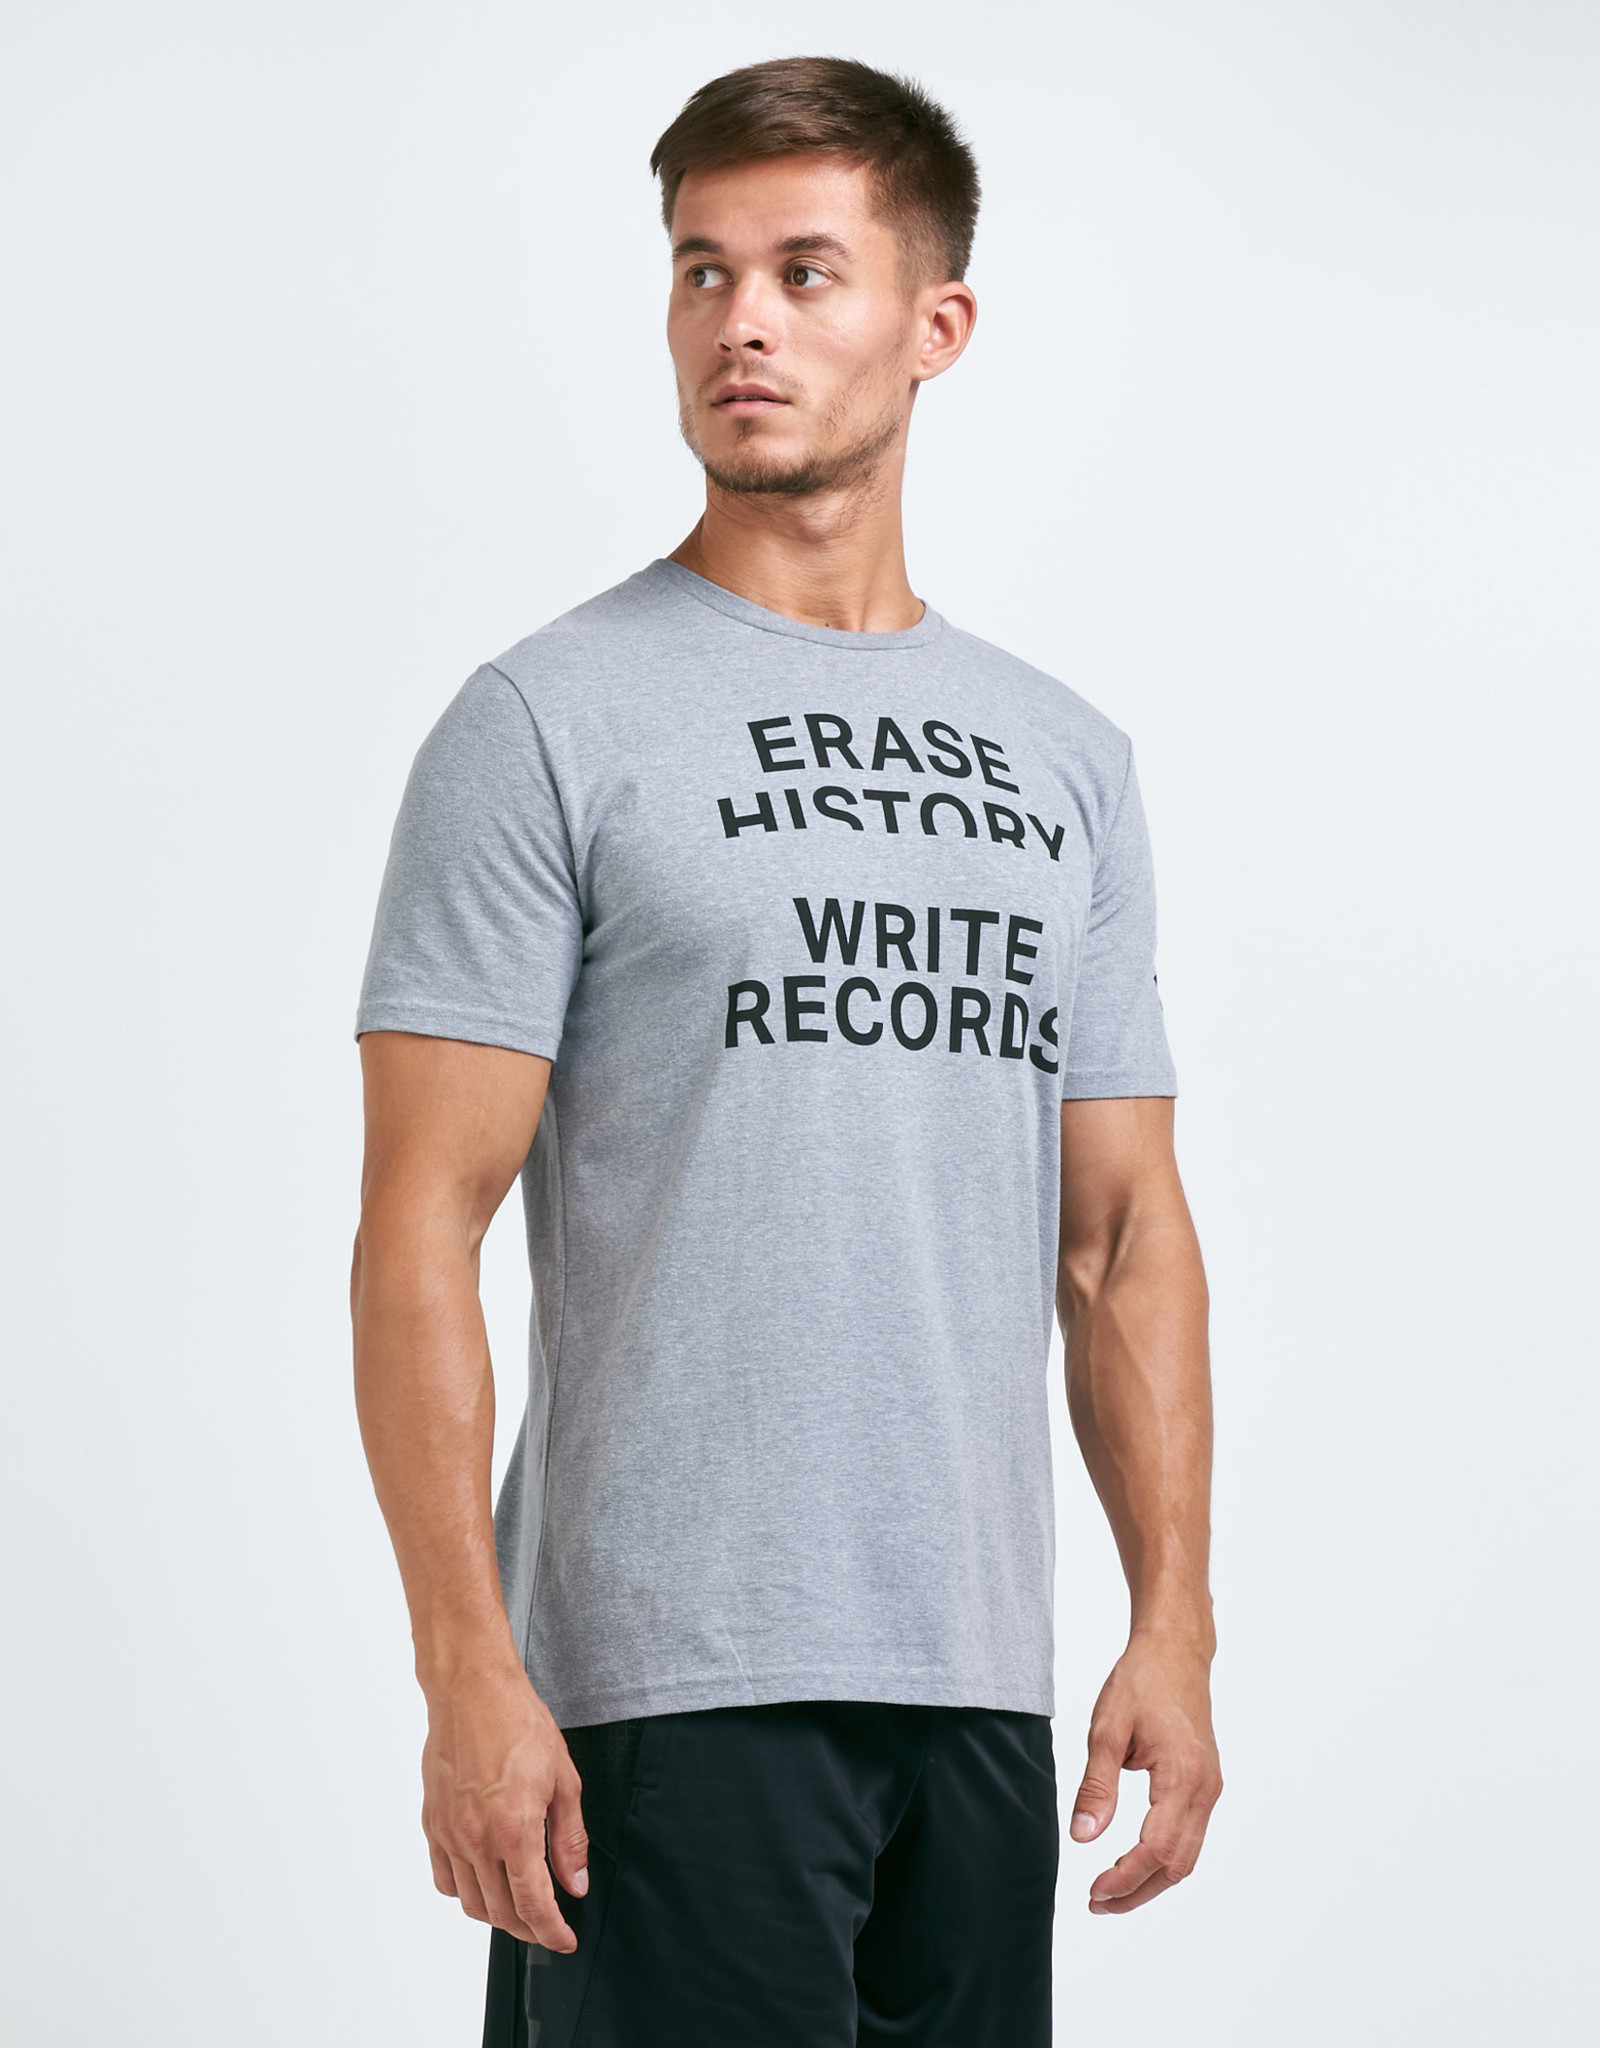 Under Armour Write Records tee - grey